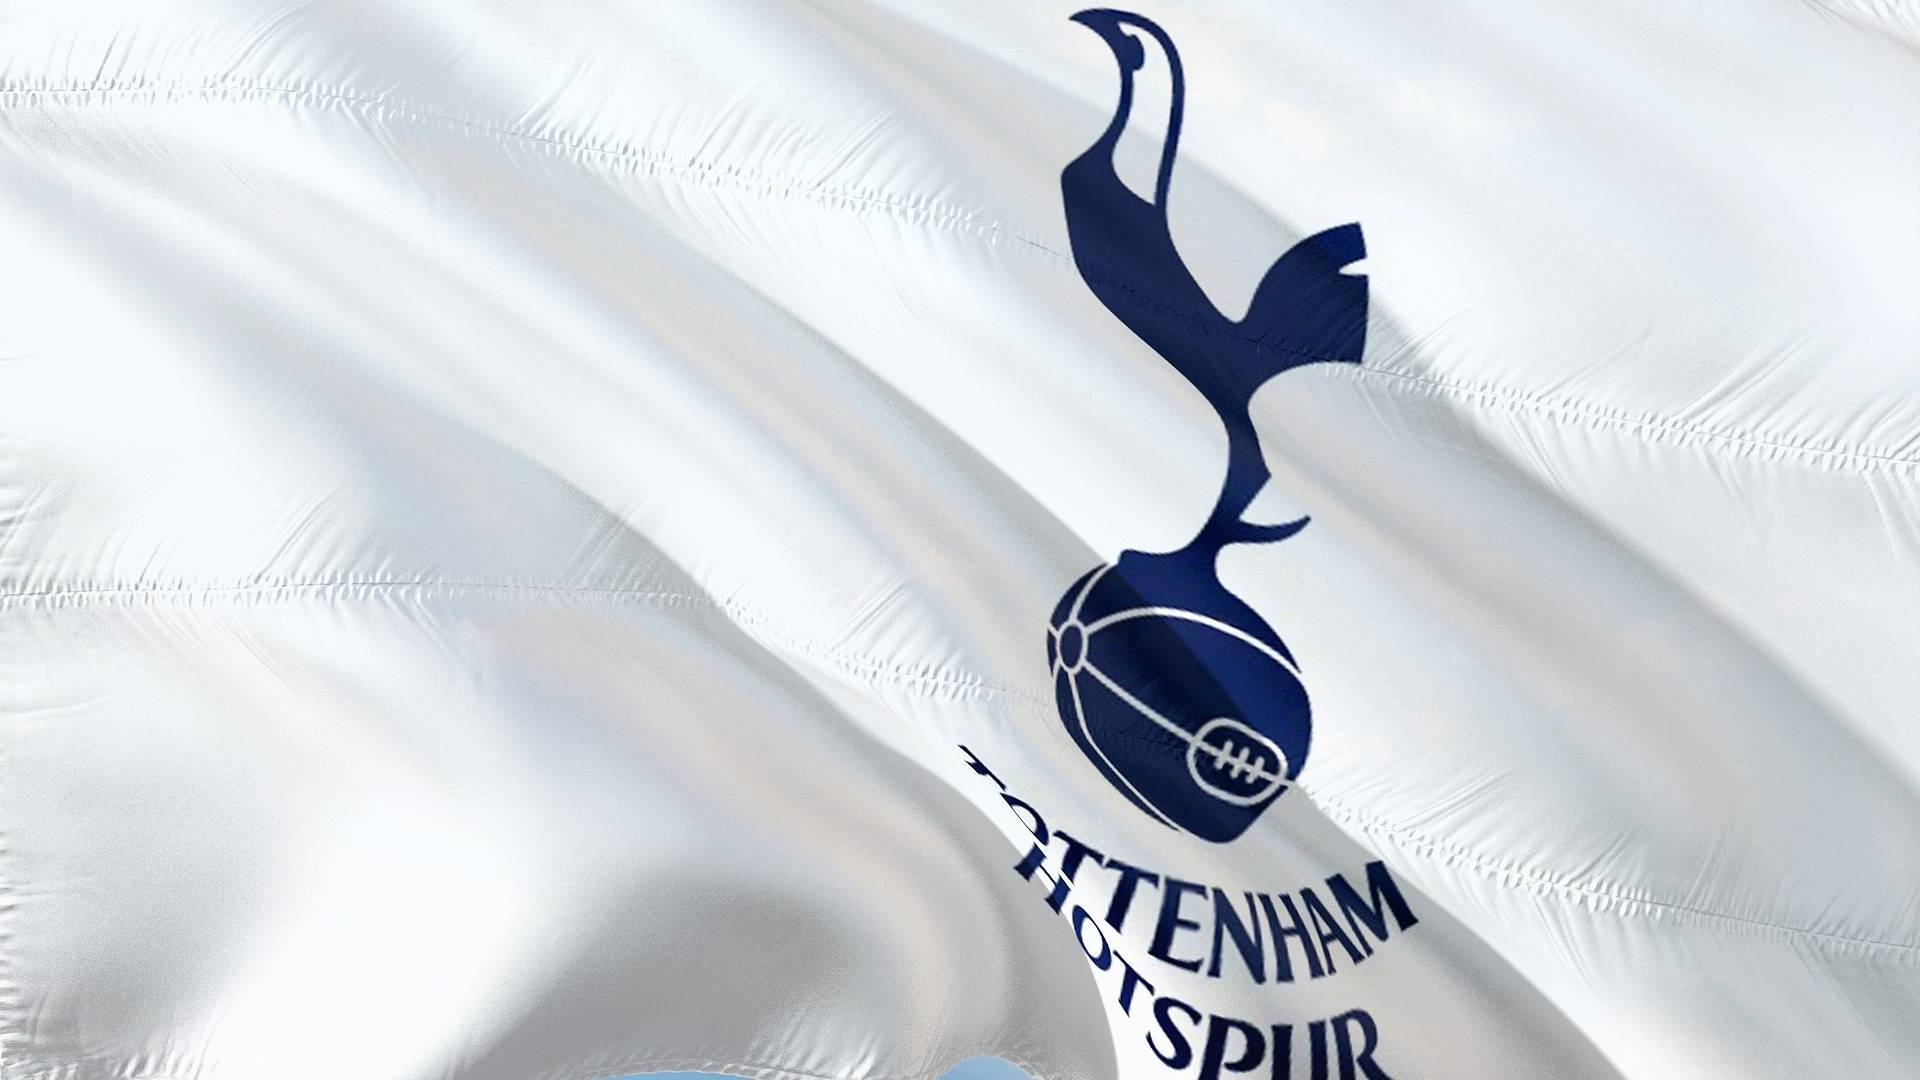 Эмблема футбольного клуба «Тоттенхэм Хотспур»